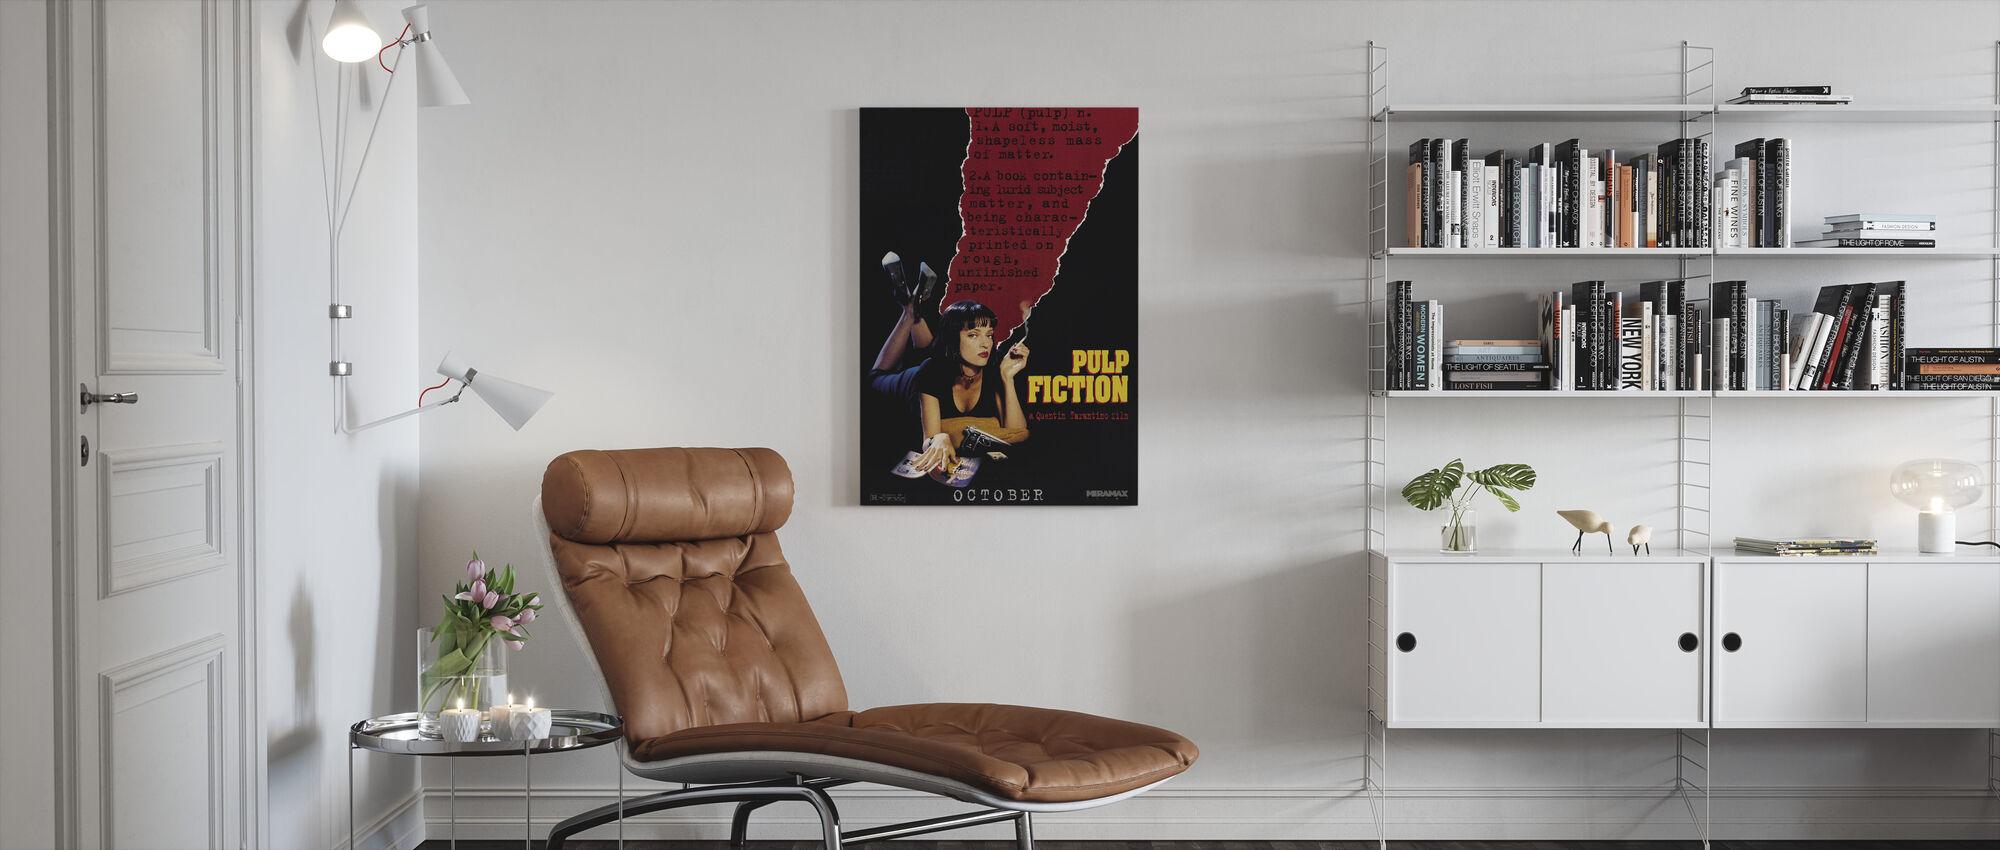 Pulp Fiction - Canvas print - Living Room